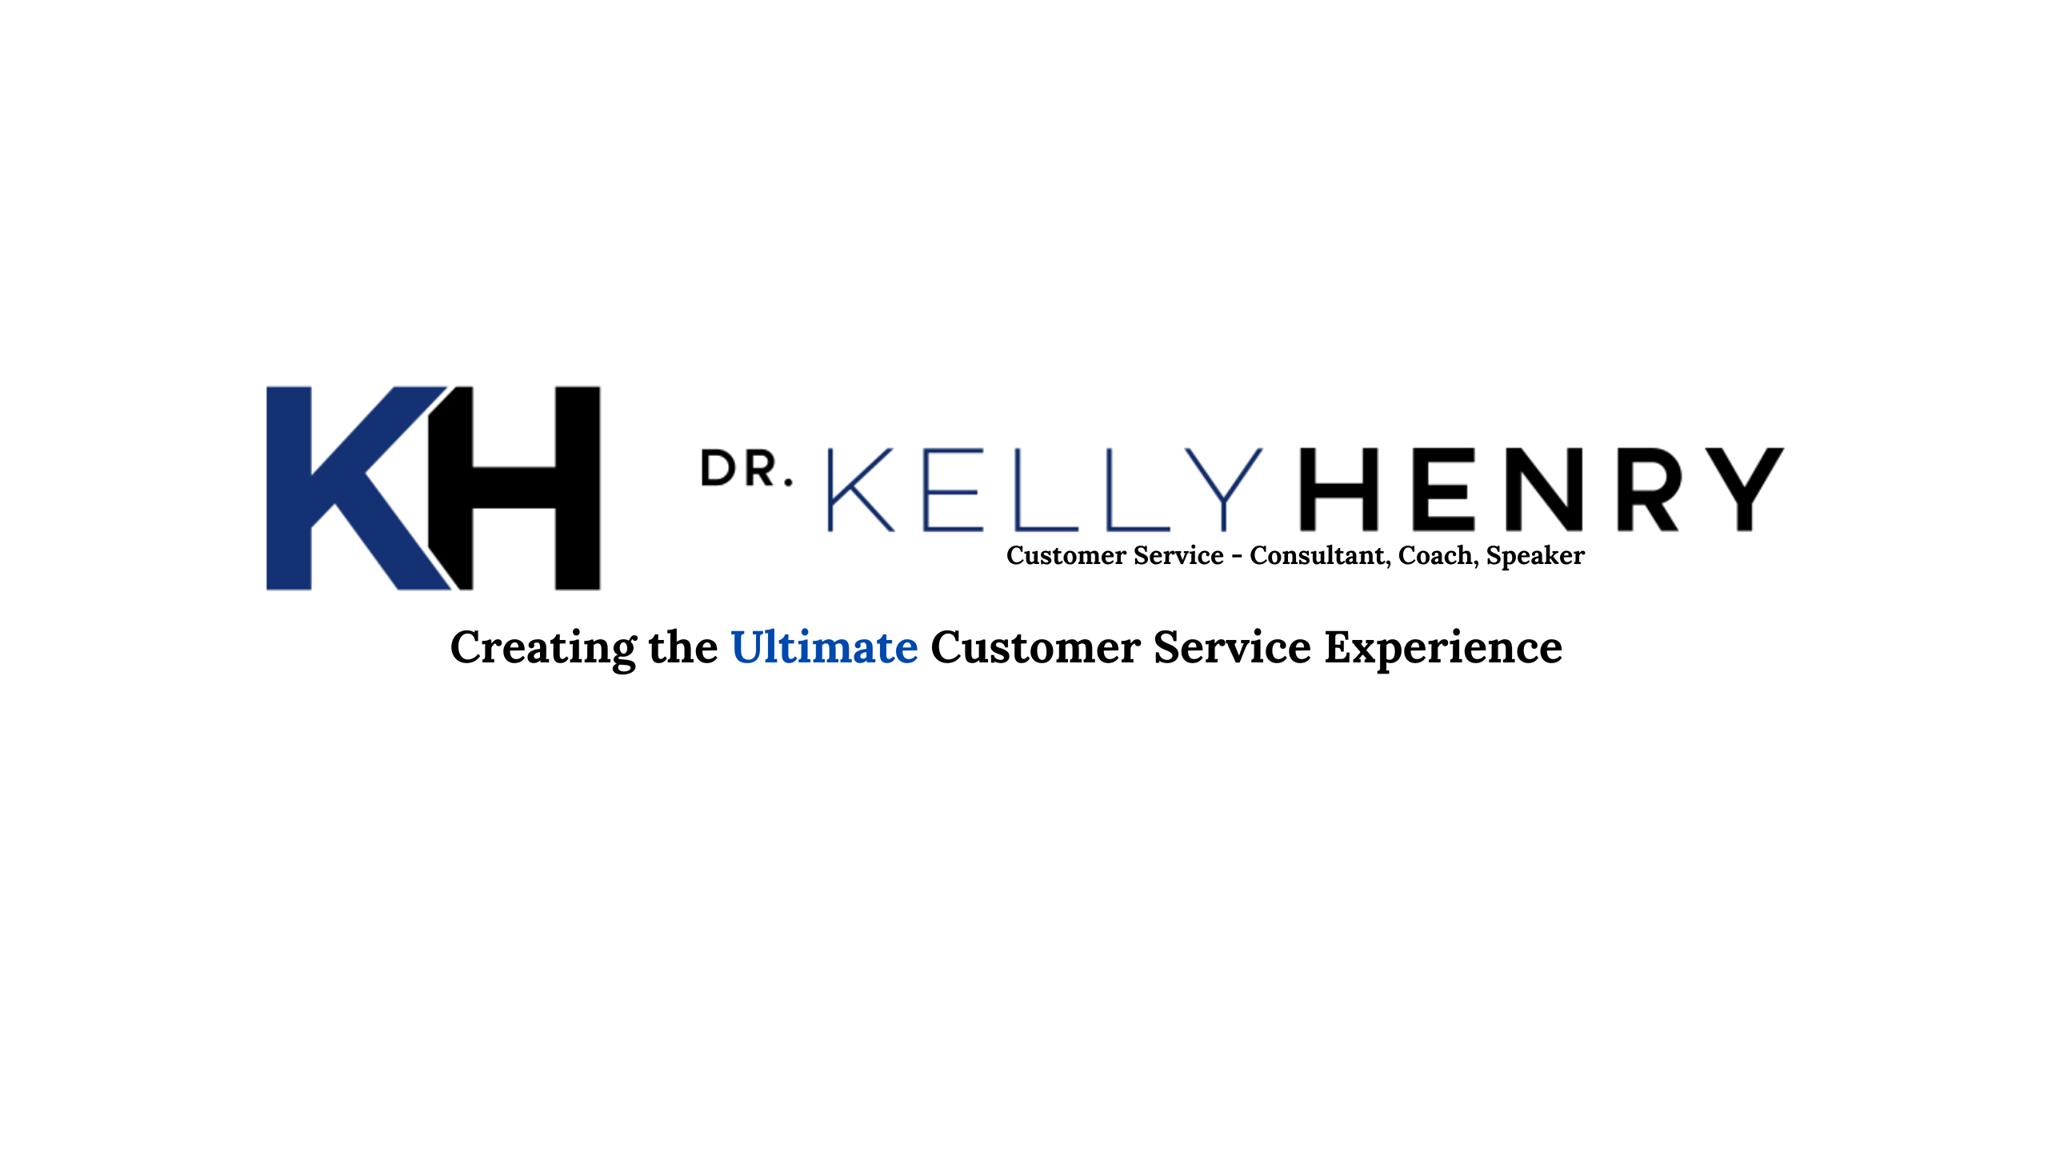 Dr. Kelly Henry